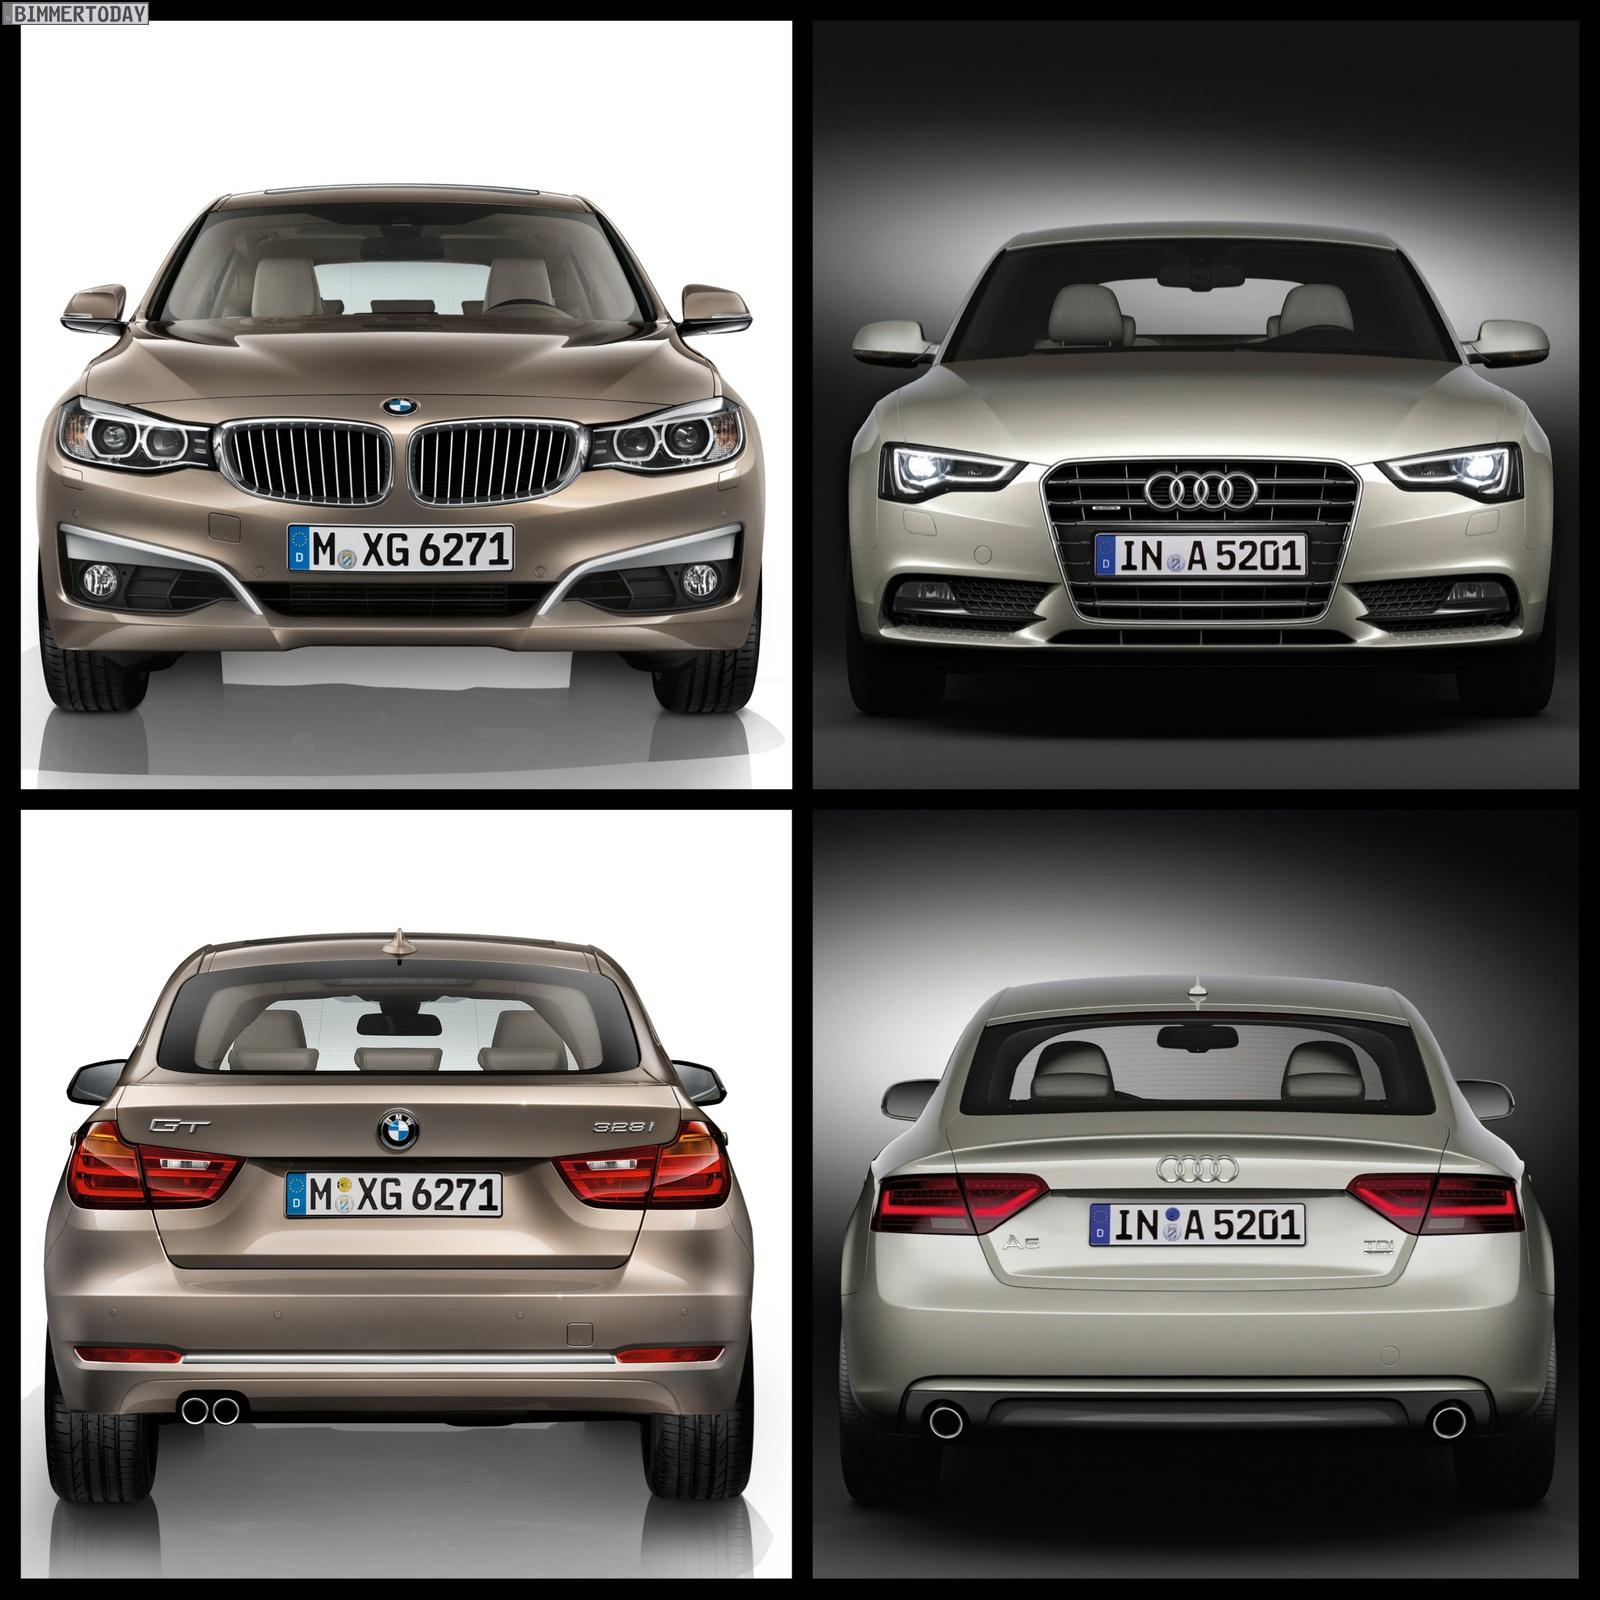 Bmw Xdrive Vs Audi Quattro: Photo Comparison: BMW 3 Series GT Vs Audi A5 Sportback